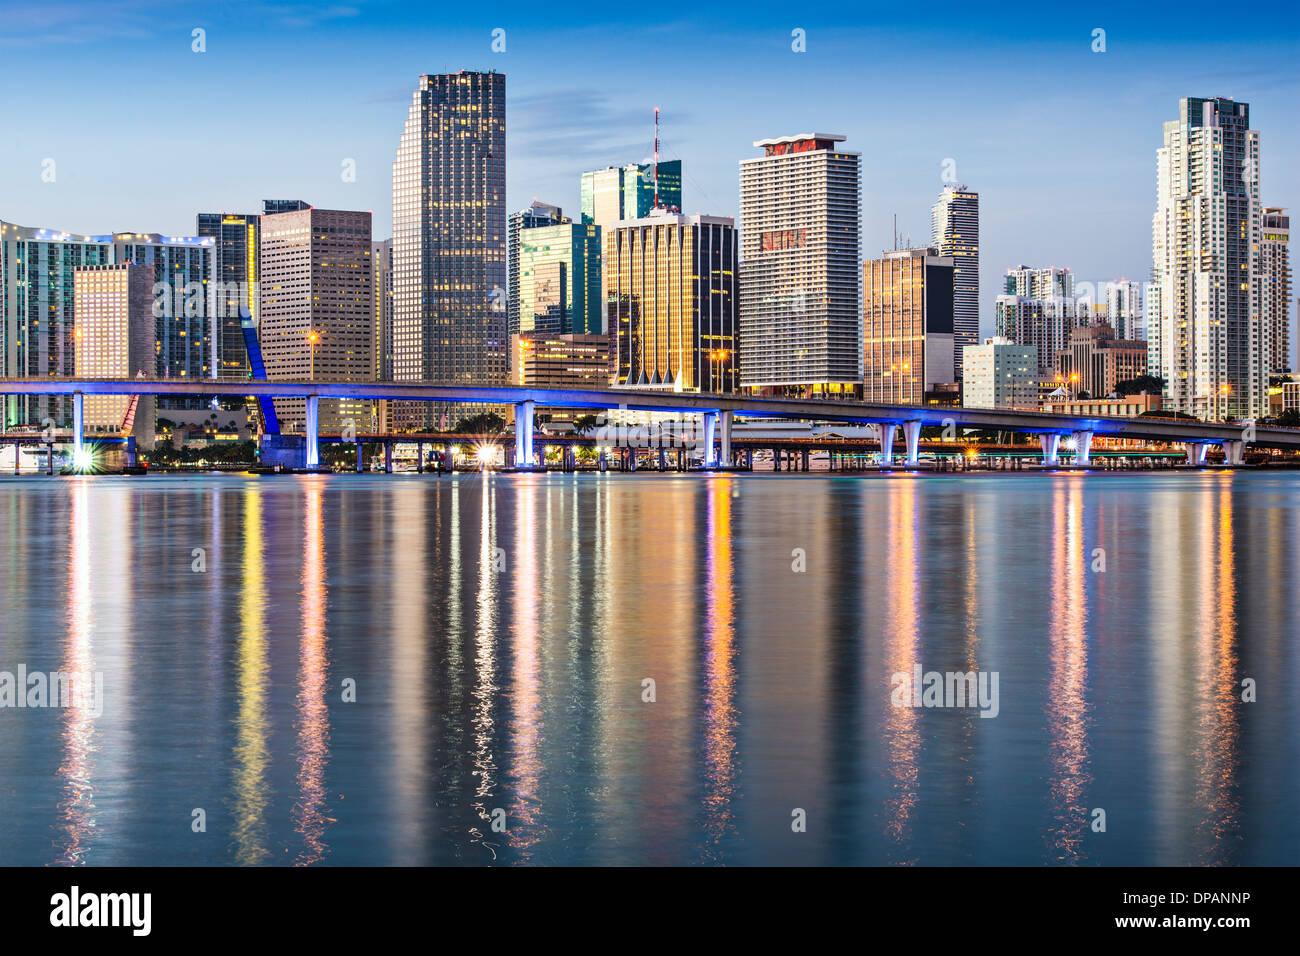 Skyline of Miami, Florida, USA. - Stock Image